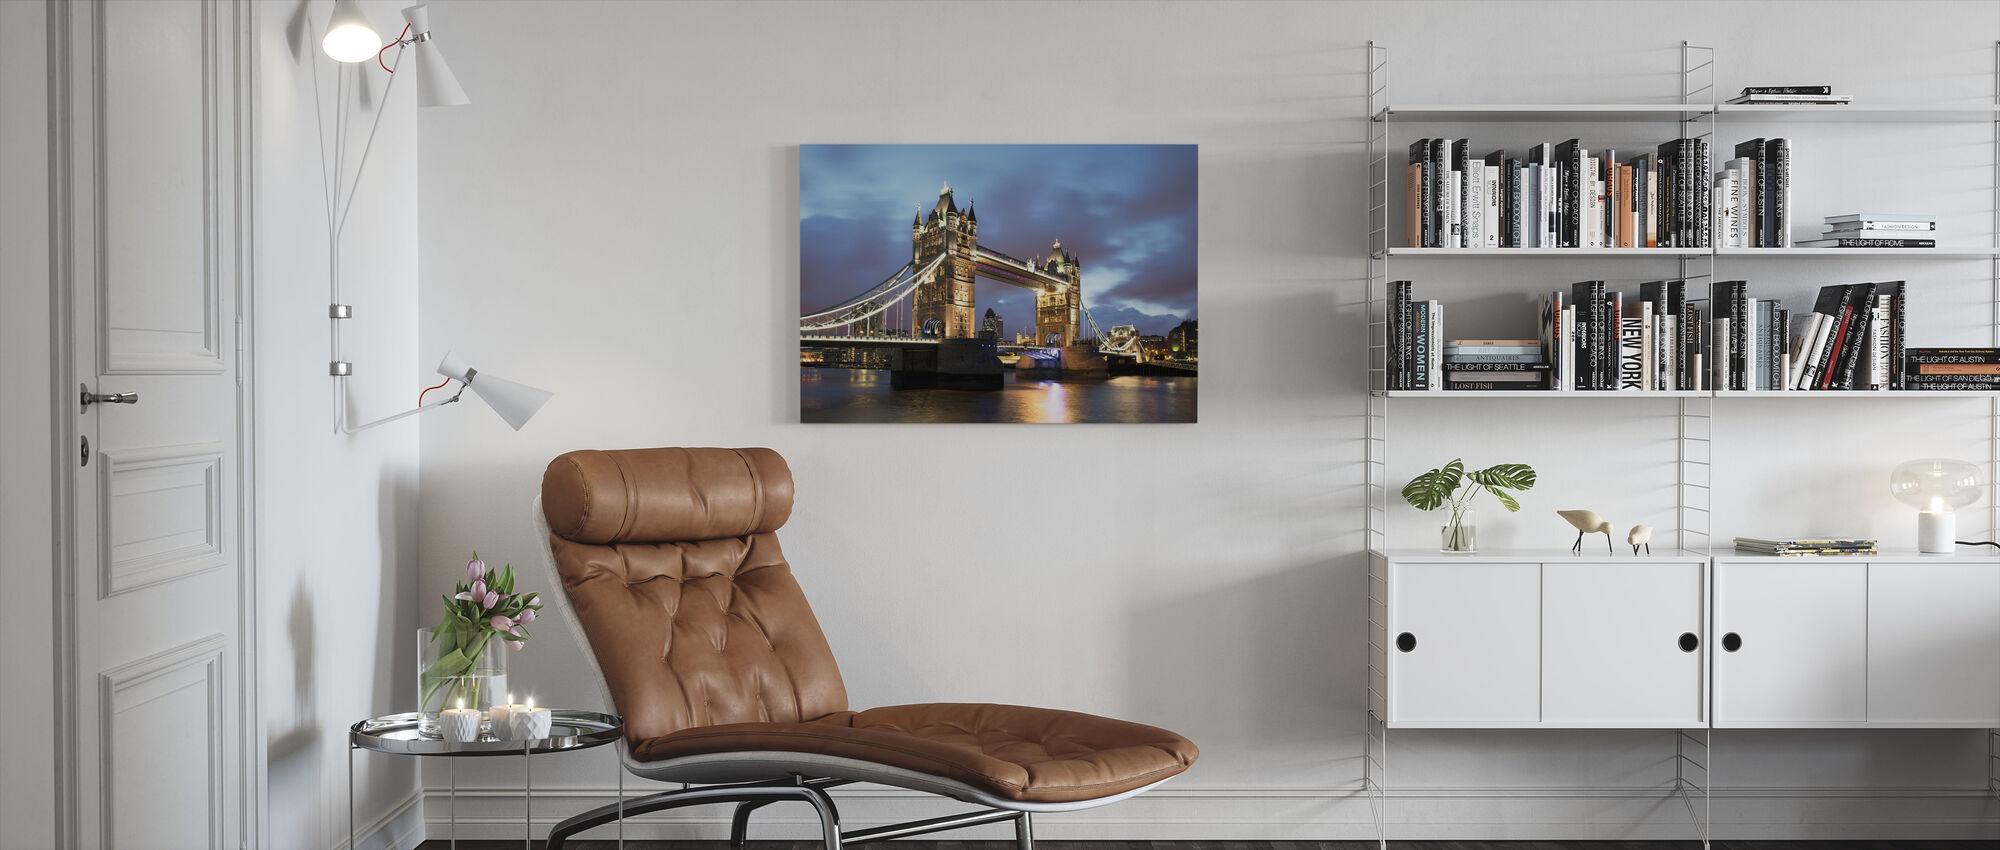 Iconic Bridge - Canvas print - Living Room